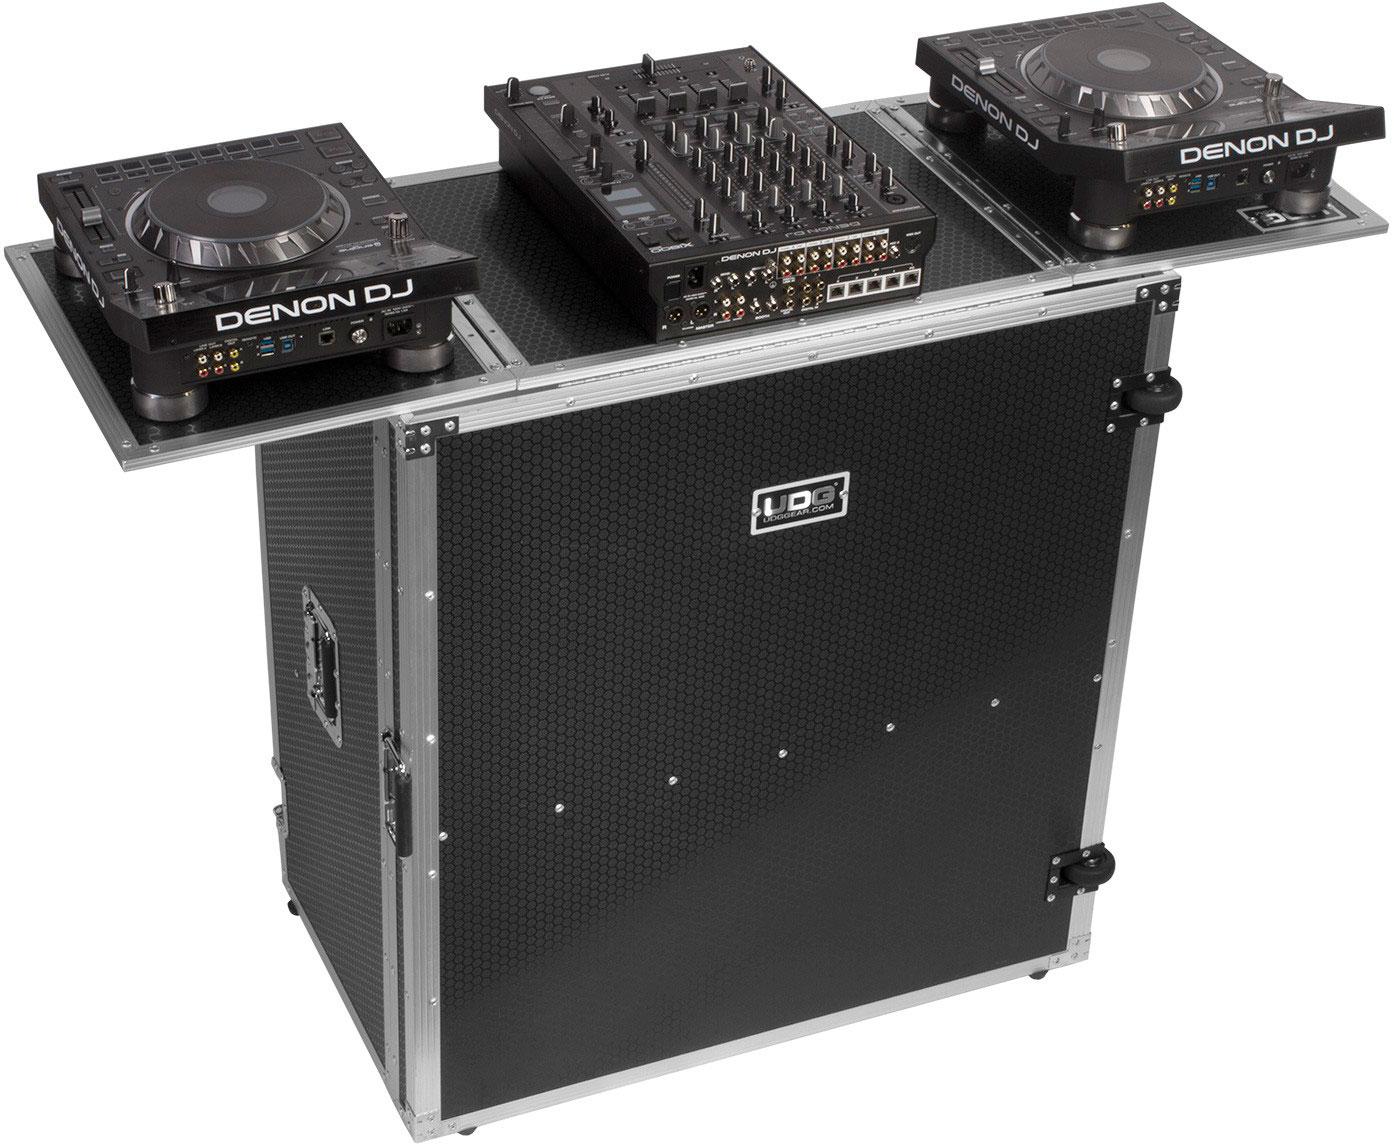 Udg U92049SL - UDG ULTIMATE FOLD OUT DJ TABLE SILVER PLUS (WHEELS)